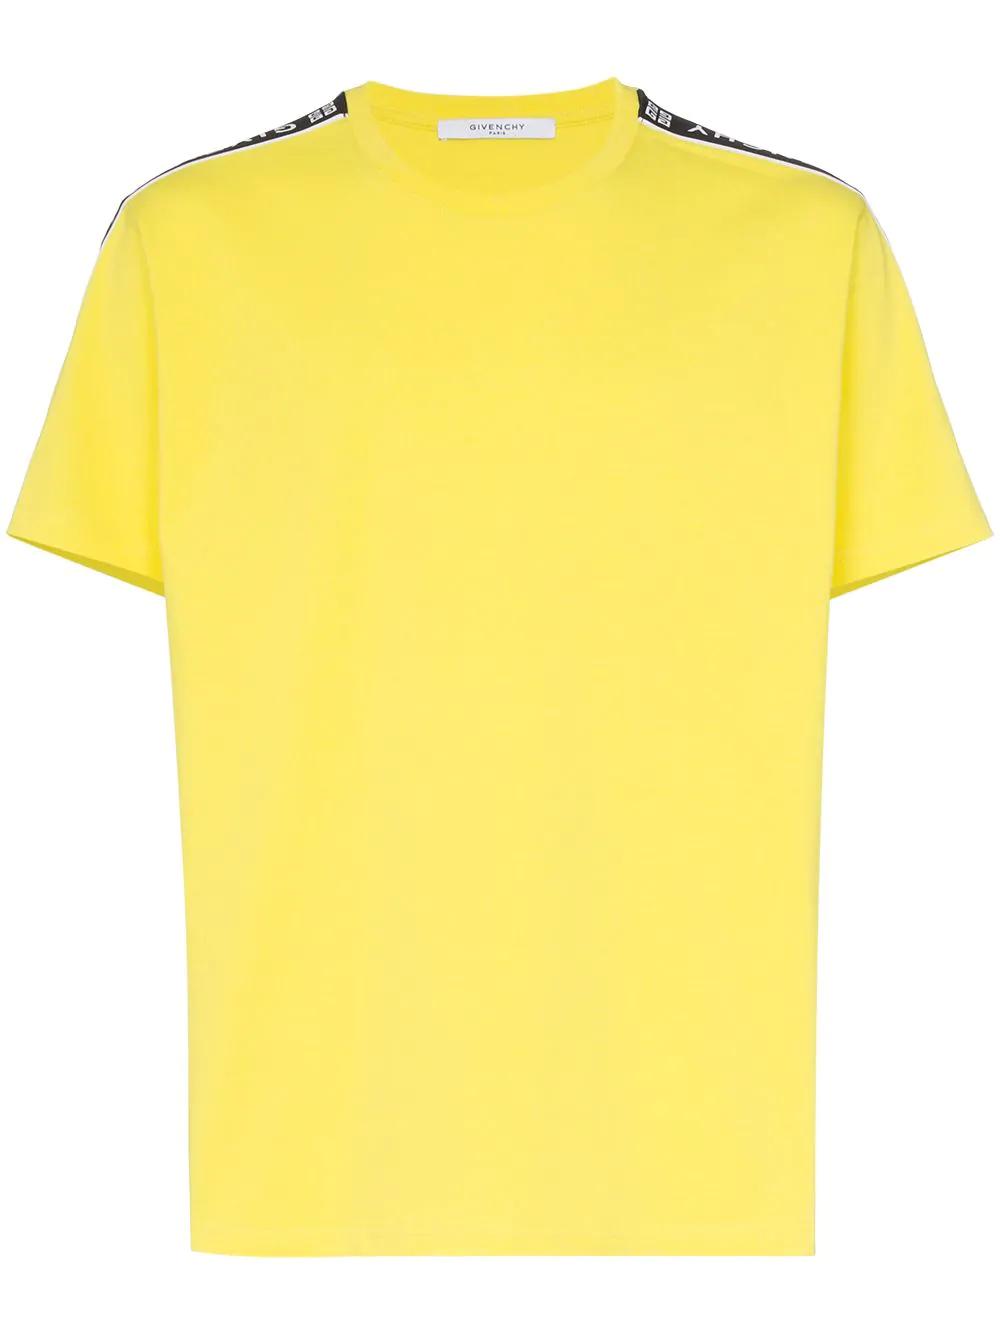 6ef4166b Givenchy - 4G Logo Trim Cotton T Shirt - Mens - Yellow | ModeSens